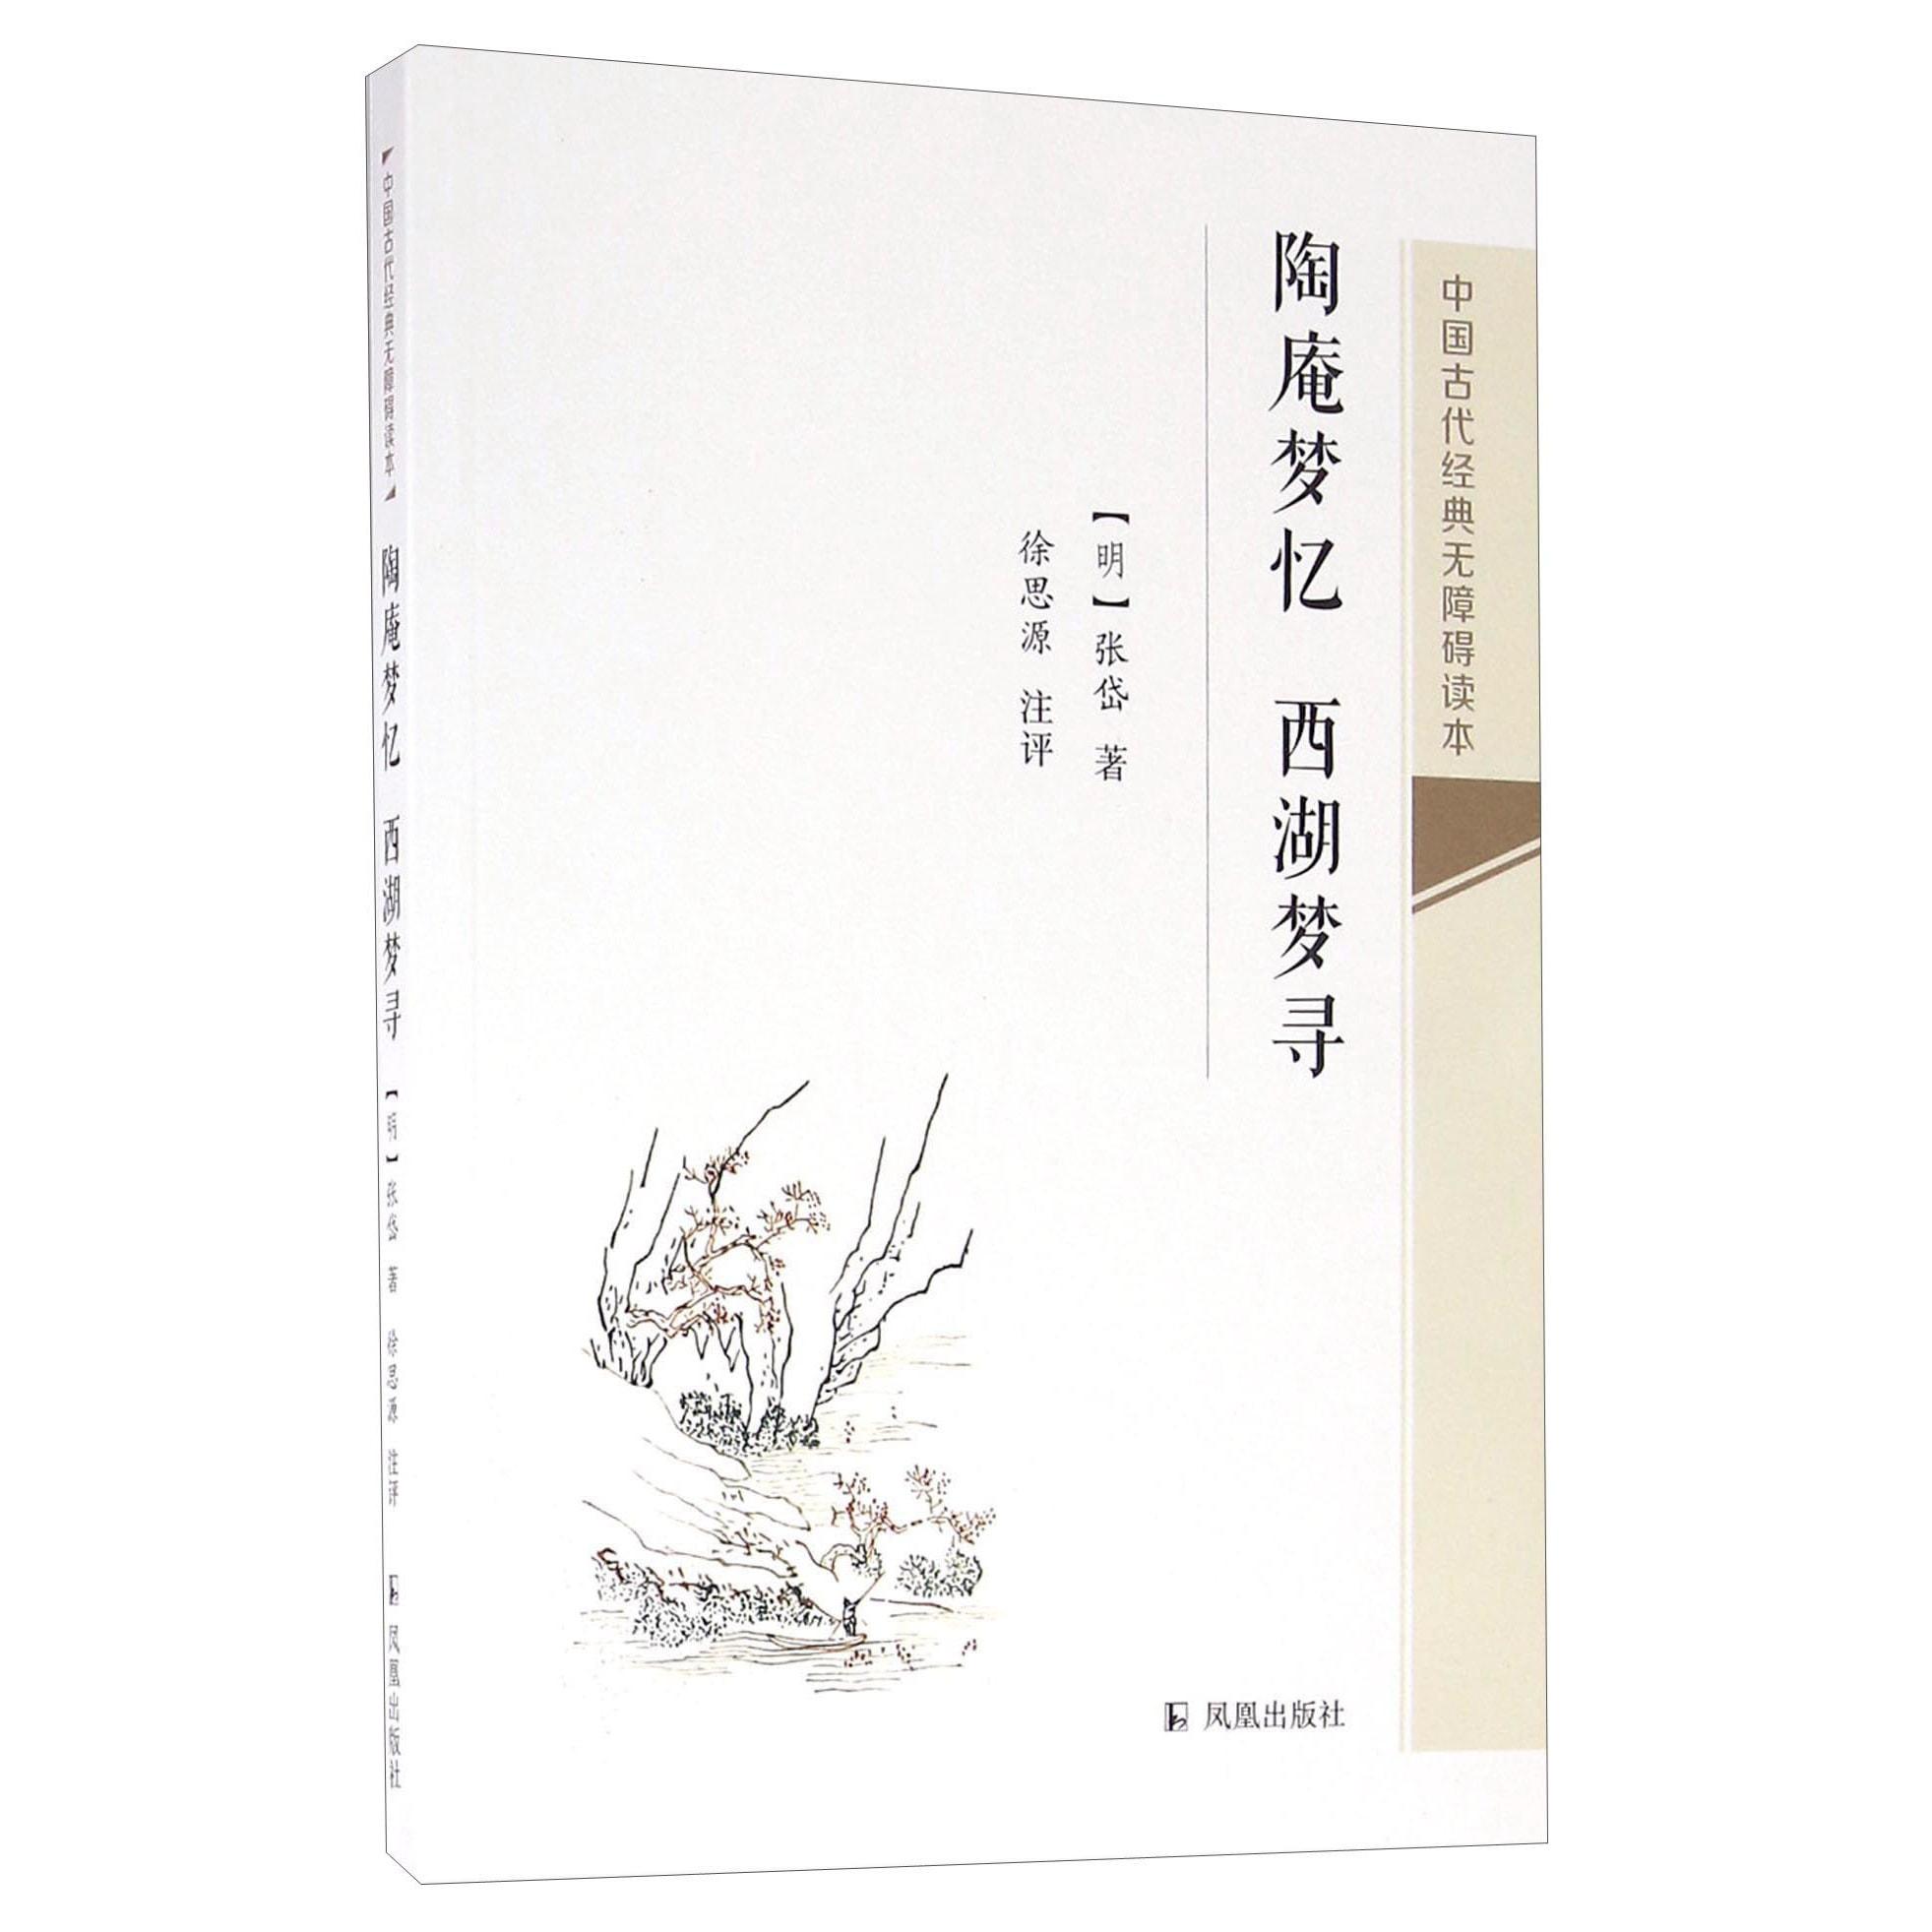 Yamibuy.com:Customer reviews:陶庵梦忆 西湖梦寻